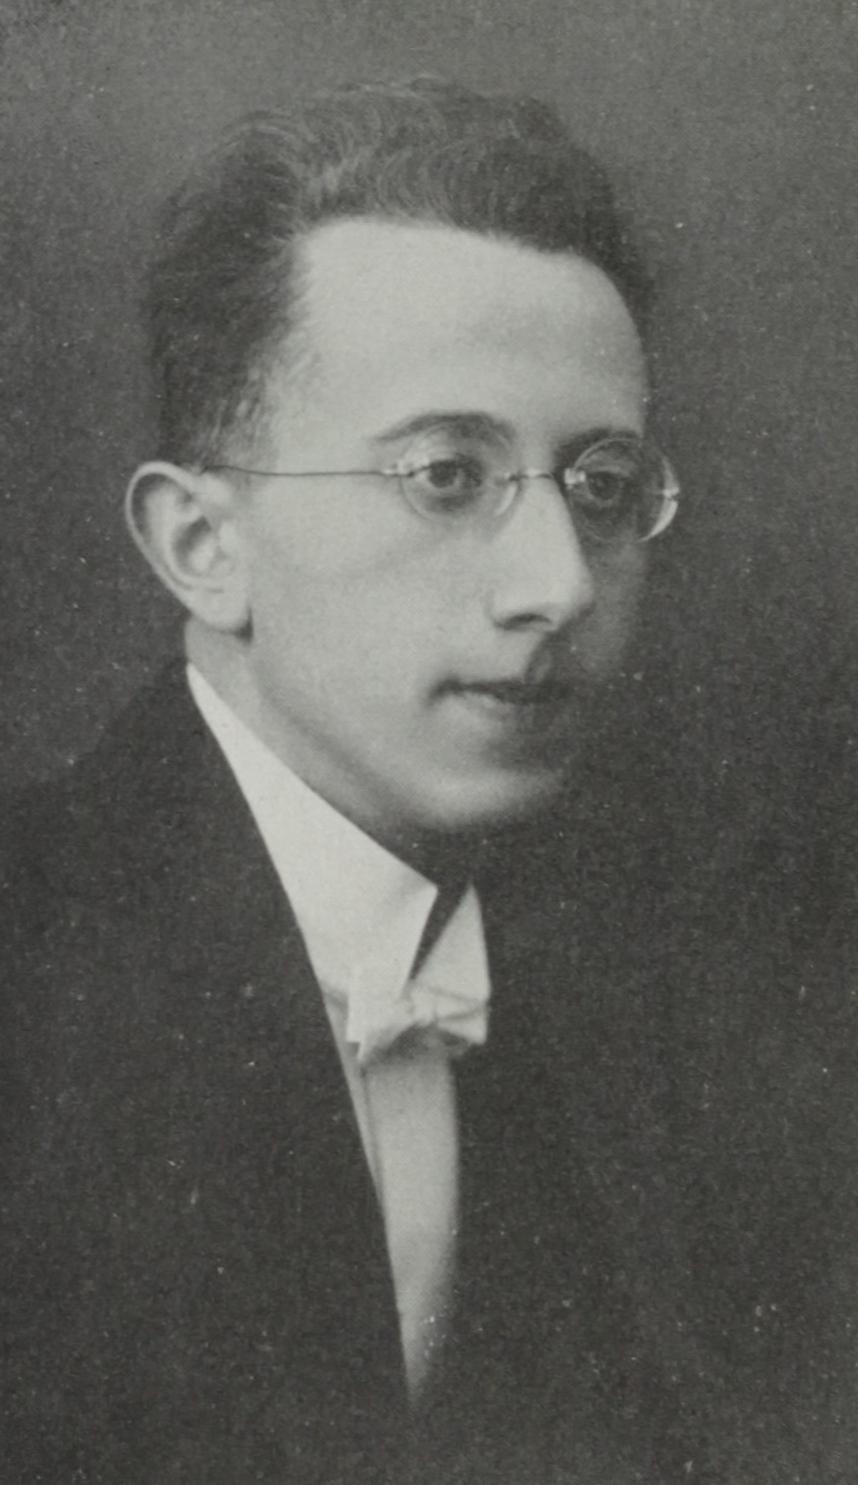 Music Director Fritz Mahler (first cousin once removed to Gustav Mahler)